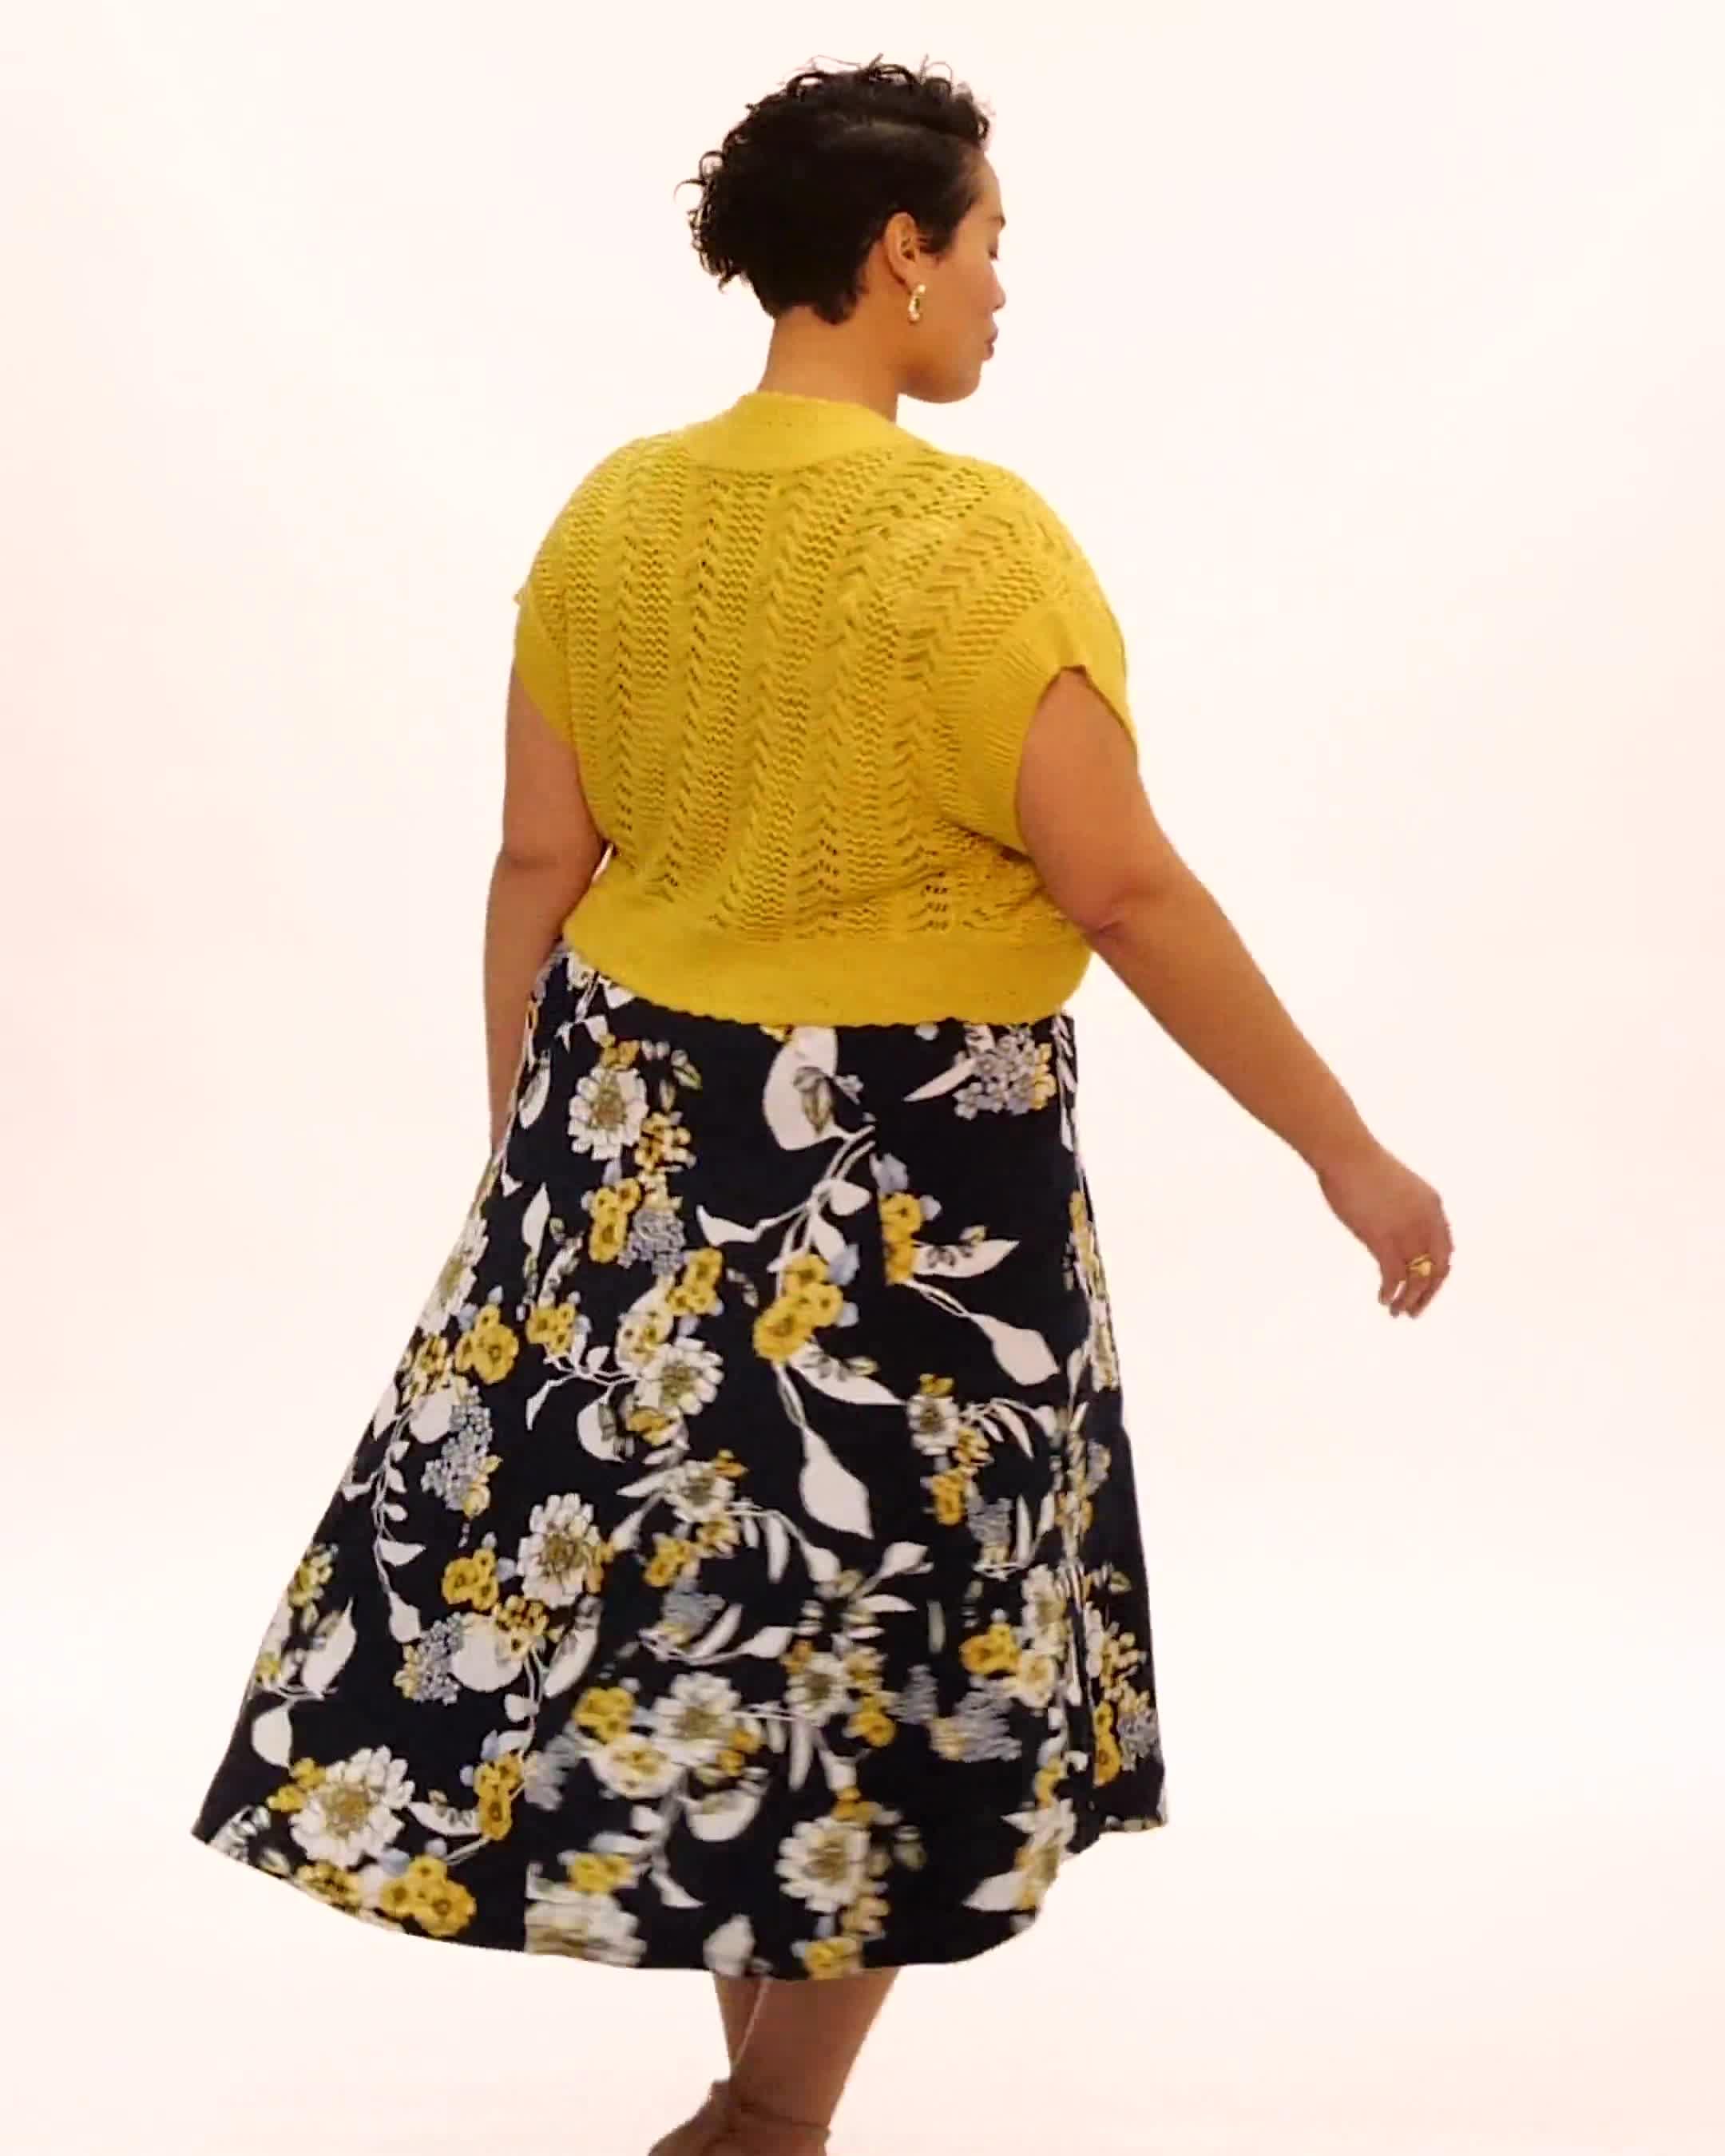 Crochet Sweater Drape Neck Floral Dress - Video